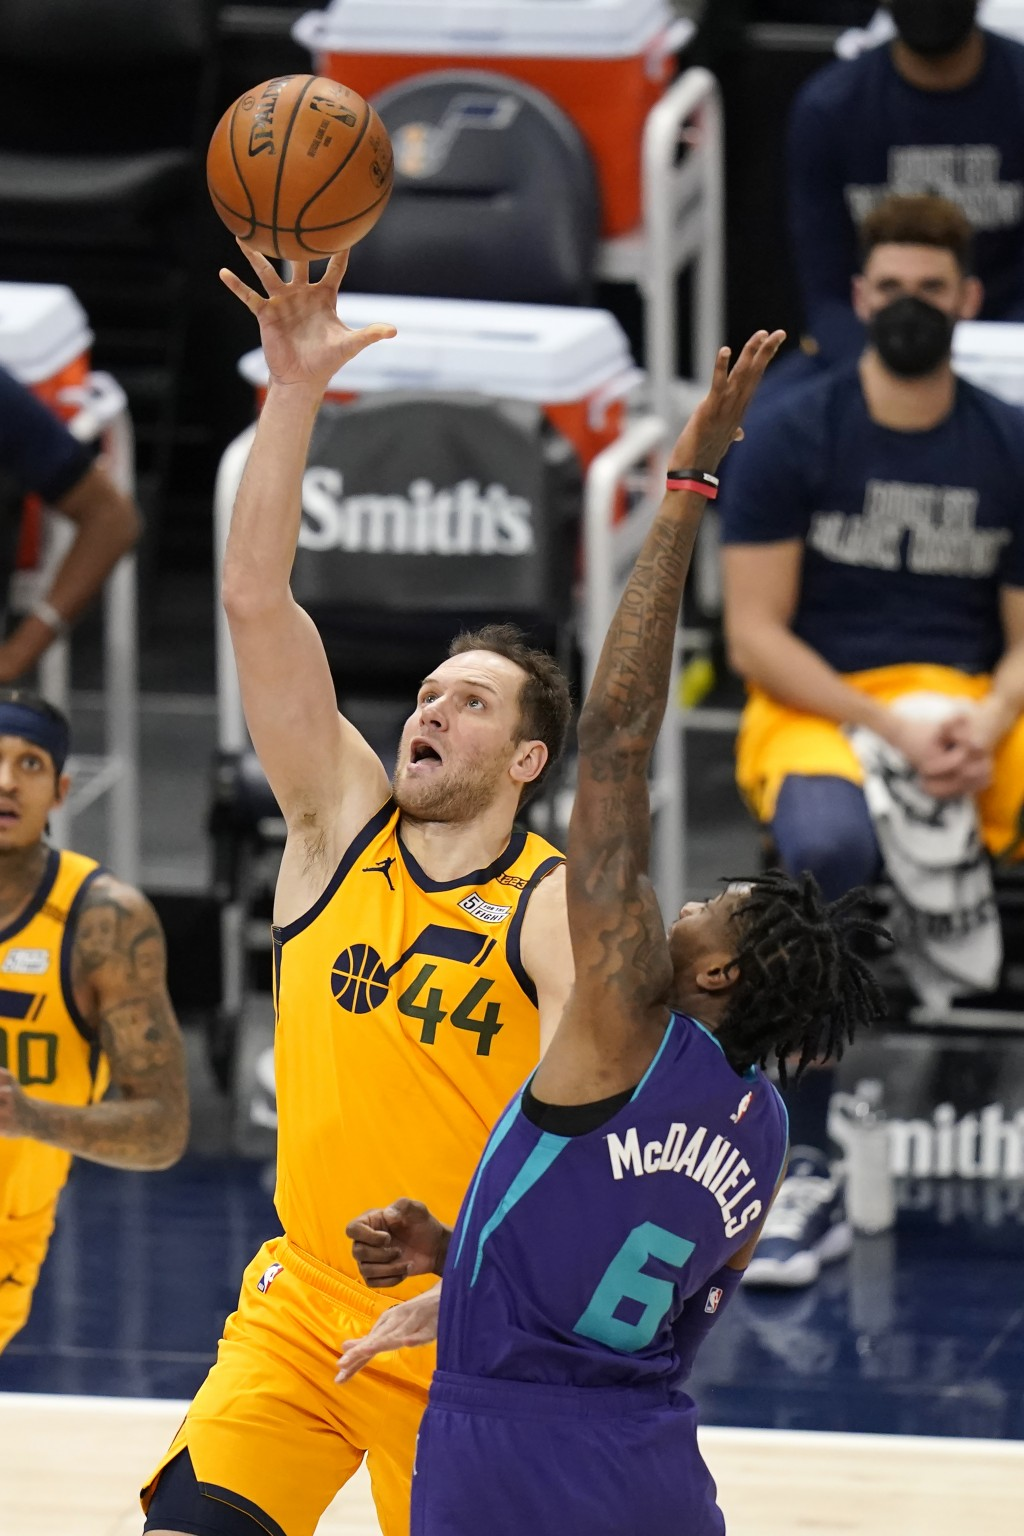 Utah Jazz forward Bojan Bogdanovic (44) lays the ball up as Charlotte Hornets forward Jalen McDaniels (6) defends in the first half during an NBA bask...